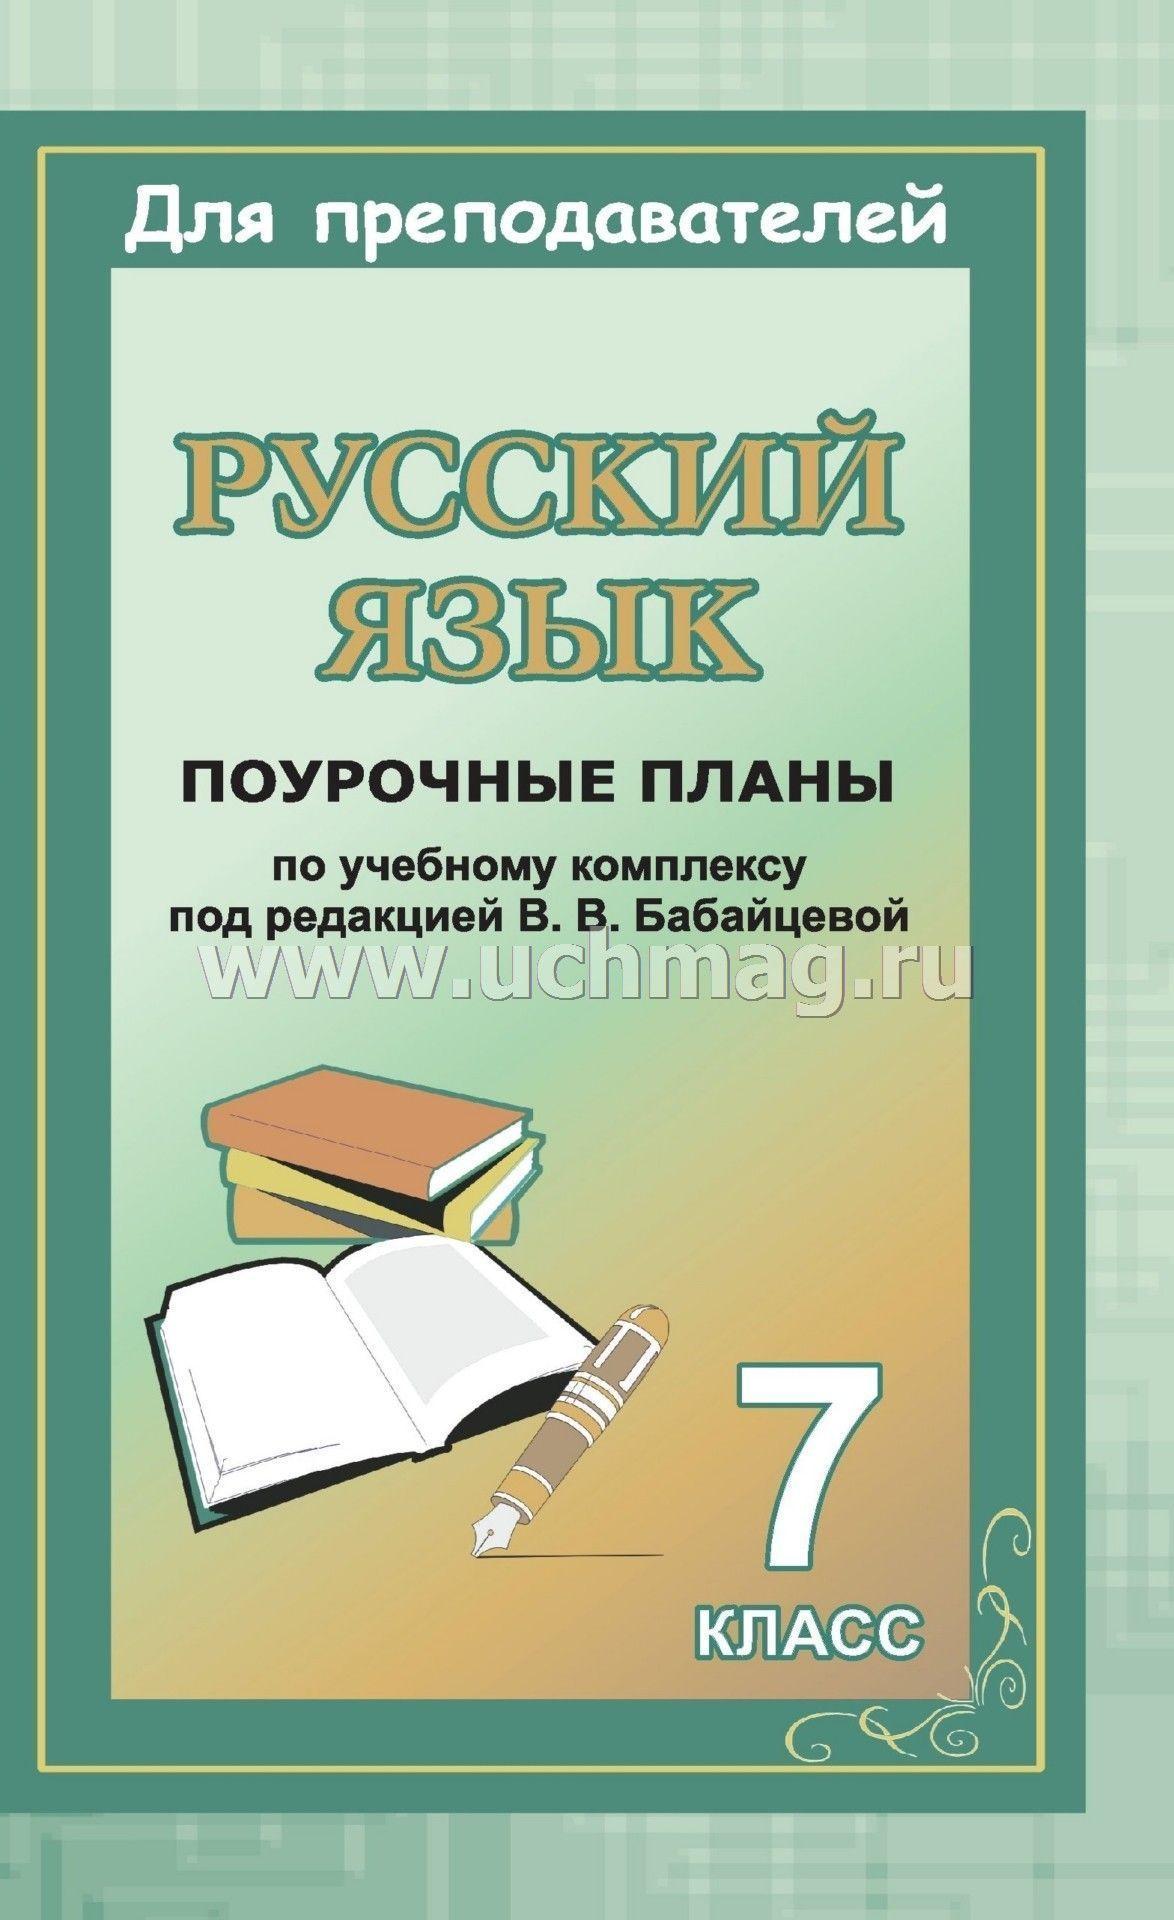 Учебник обж 6 класса читать онлайн